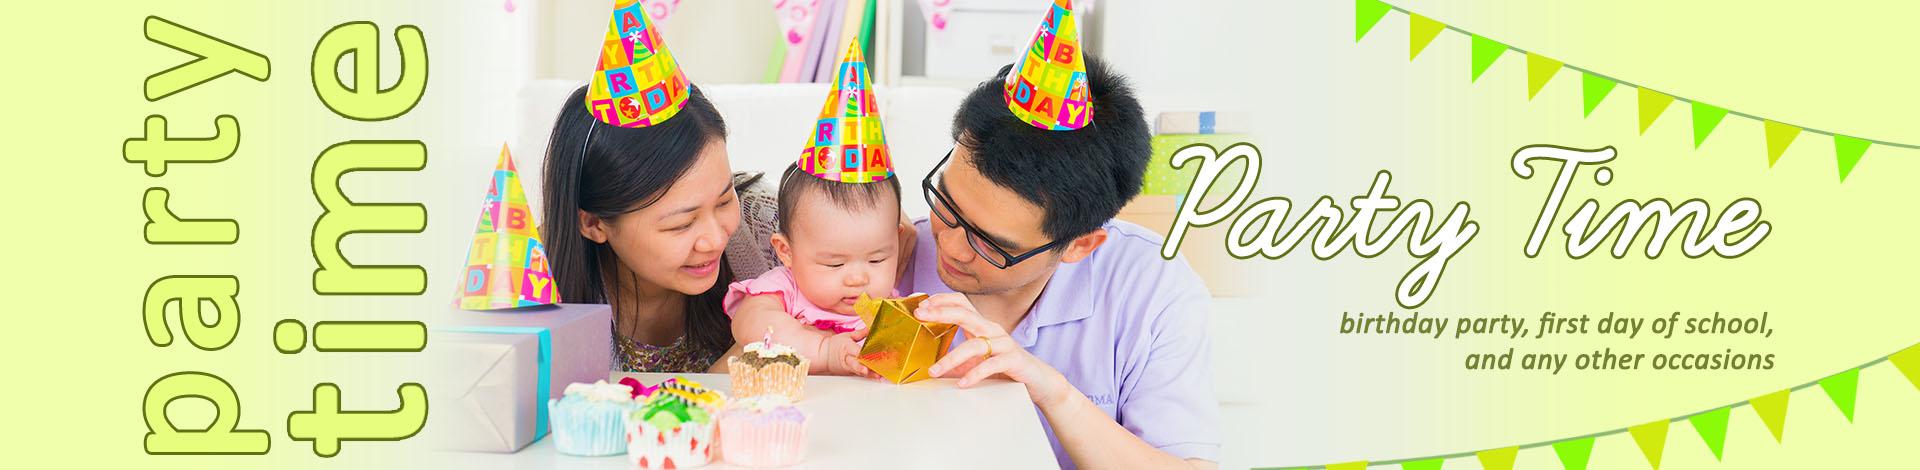 magni baby photo photography foto studio bayi maternity photo foto kehamilan pregnancy photo foto kelahiran birthday party photo foto liputan ulang tahun anak family photo outdoor foto keluarga jakarta indonesia